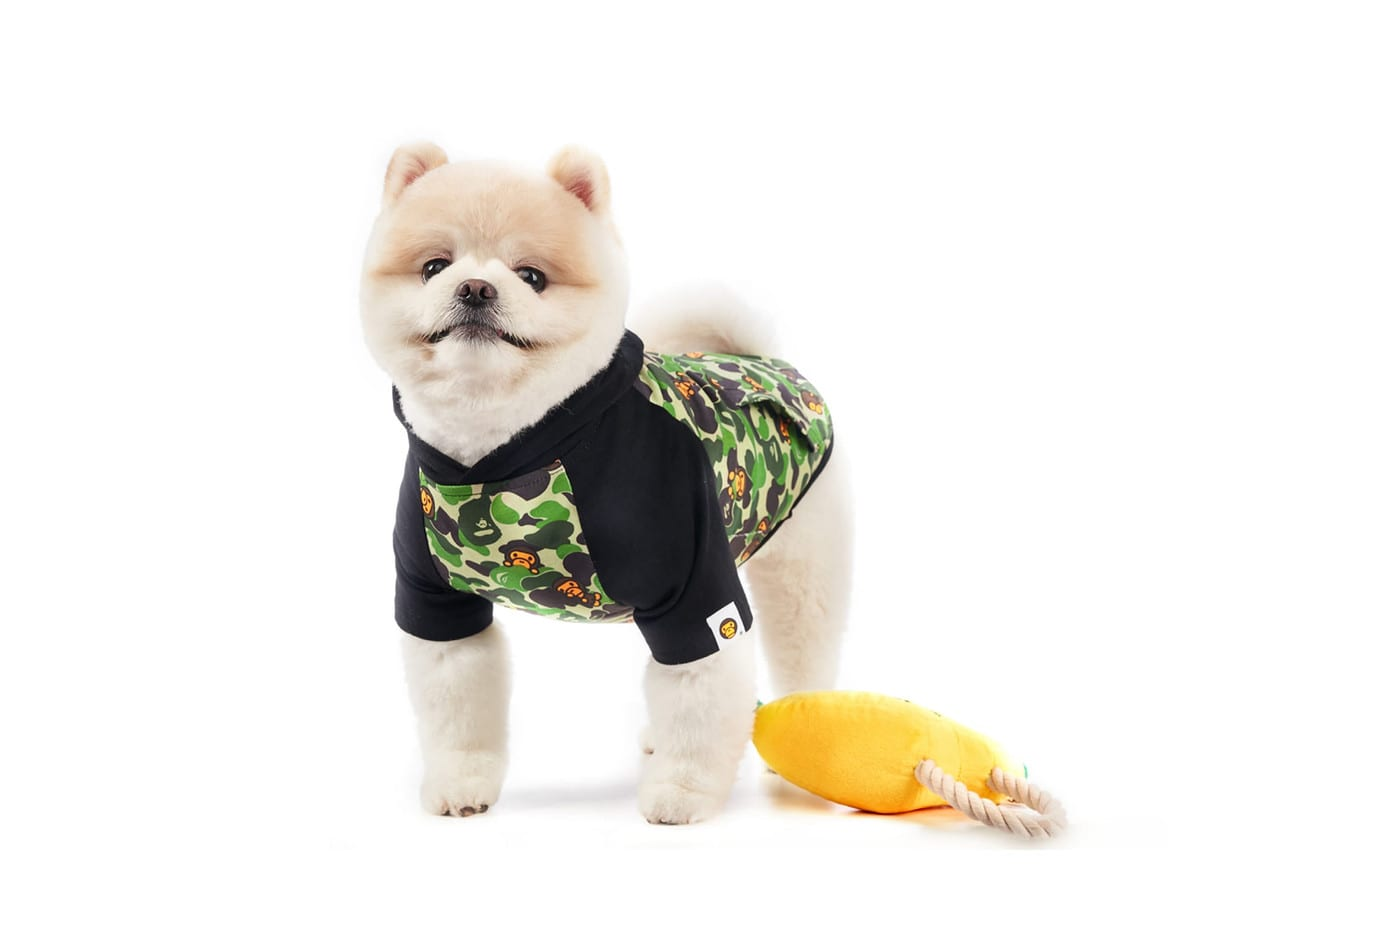 BAPE's Baby Milo Dog Collection